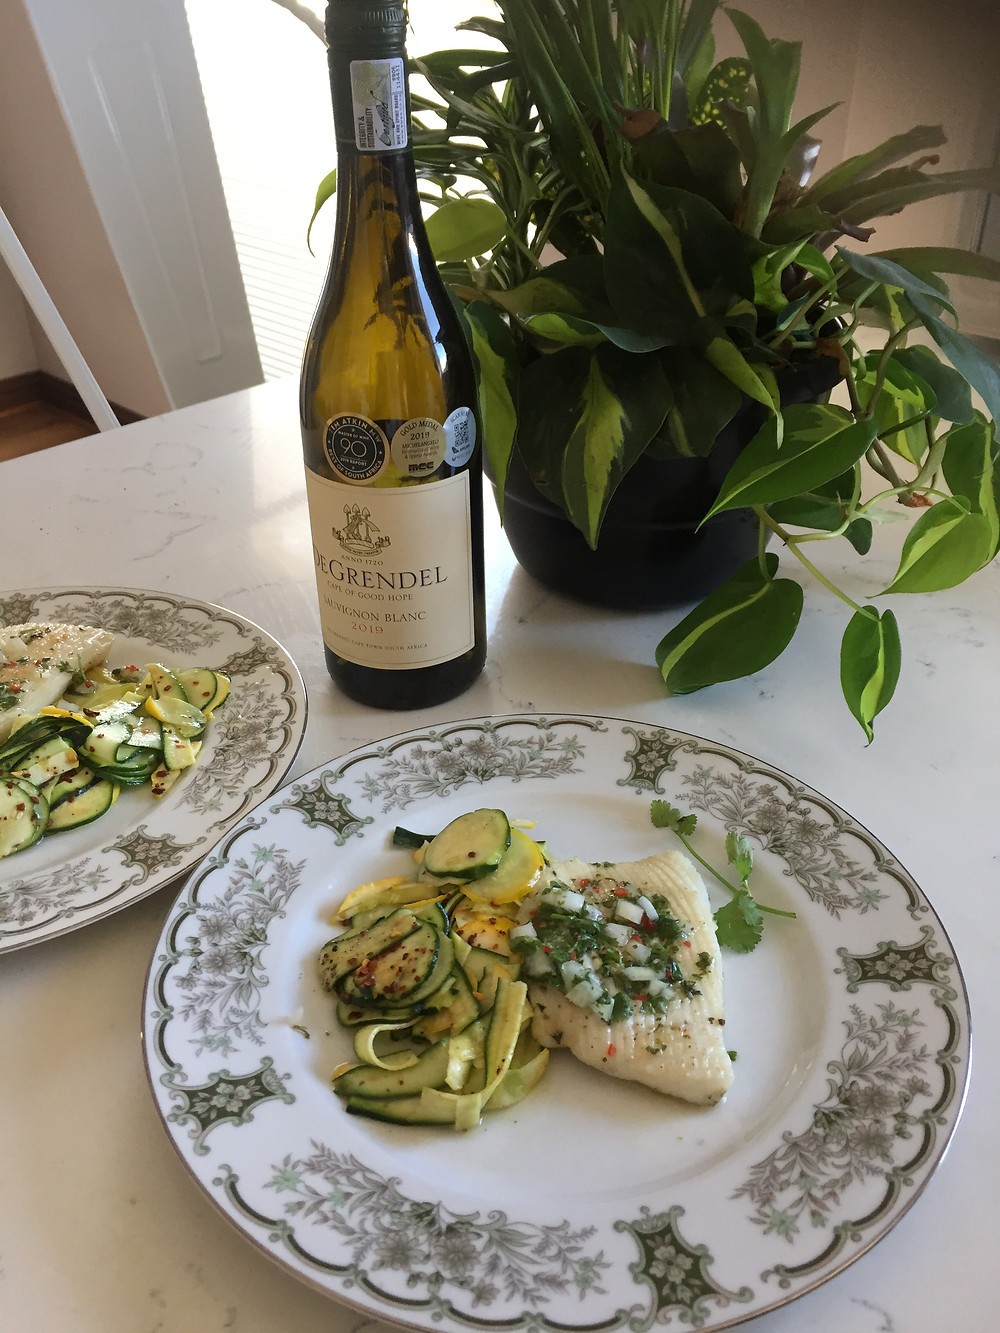 Wine pairing. De Grendel Sauvignon Blanc paired with Calamari Steak and Baby Marrow salad.